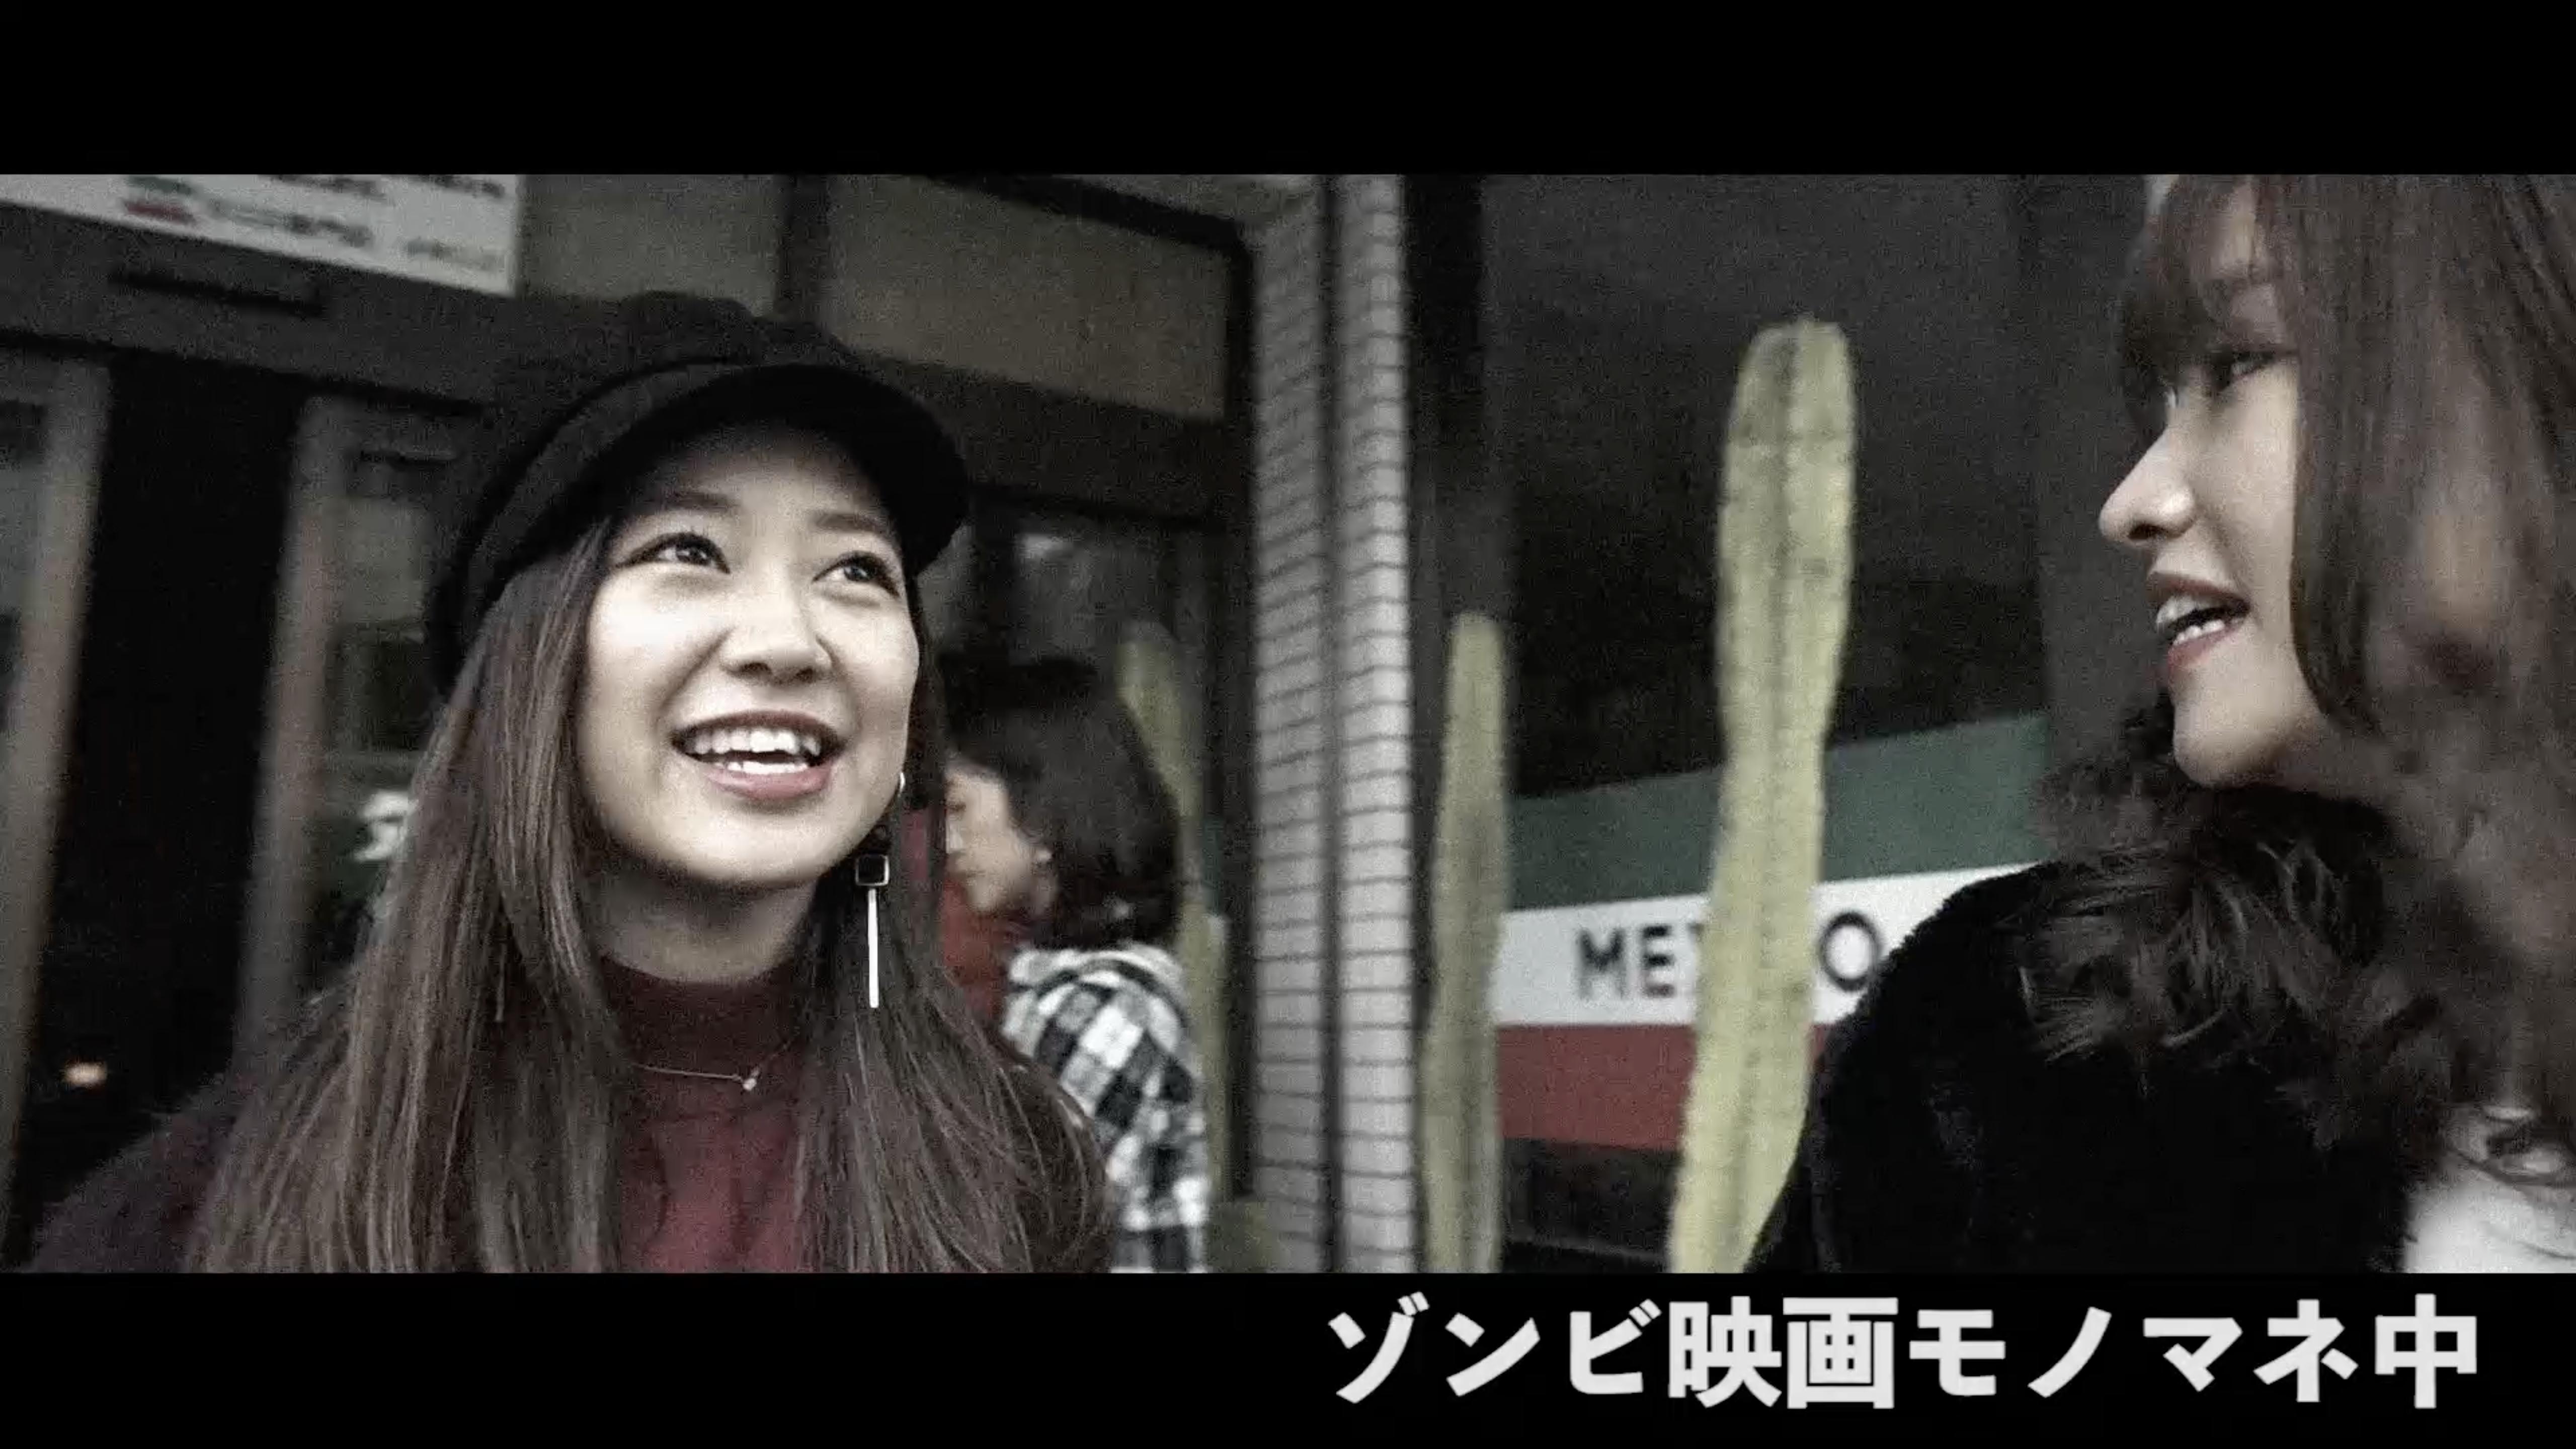 hy4_4yh(ハイパーヨーヨ)ドキュメンタリー第8話 画像01